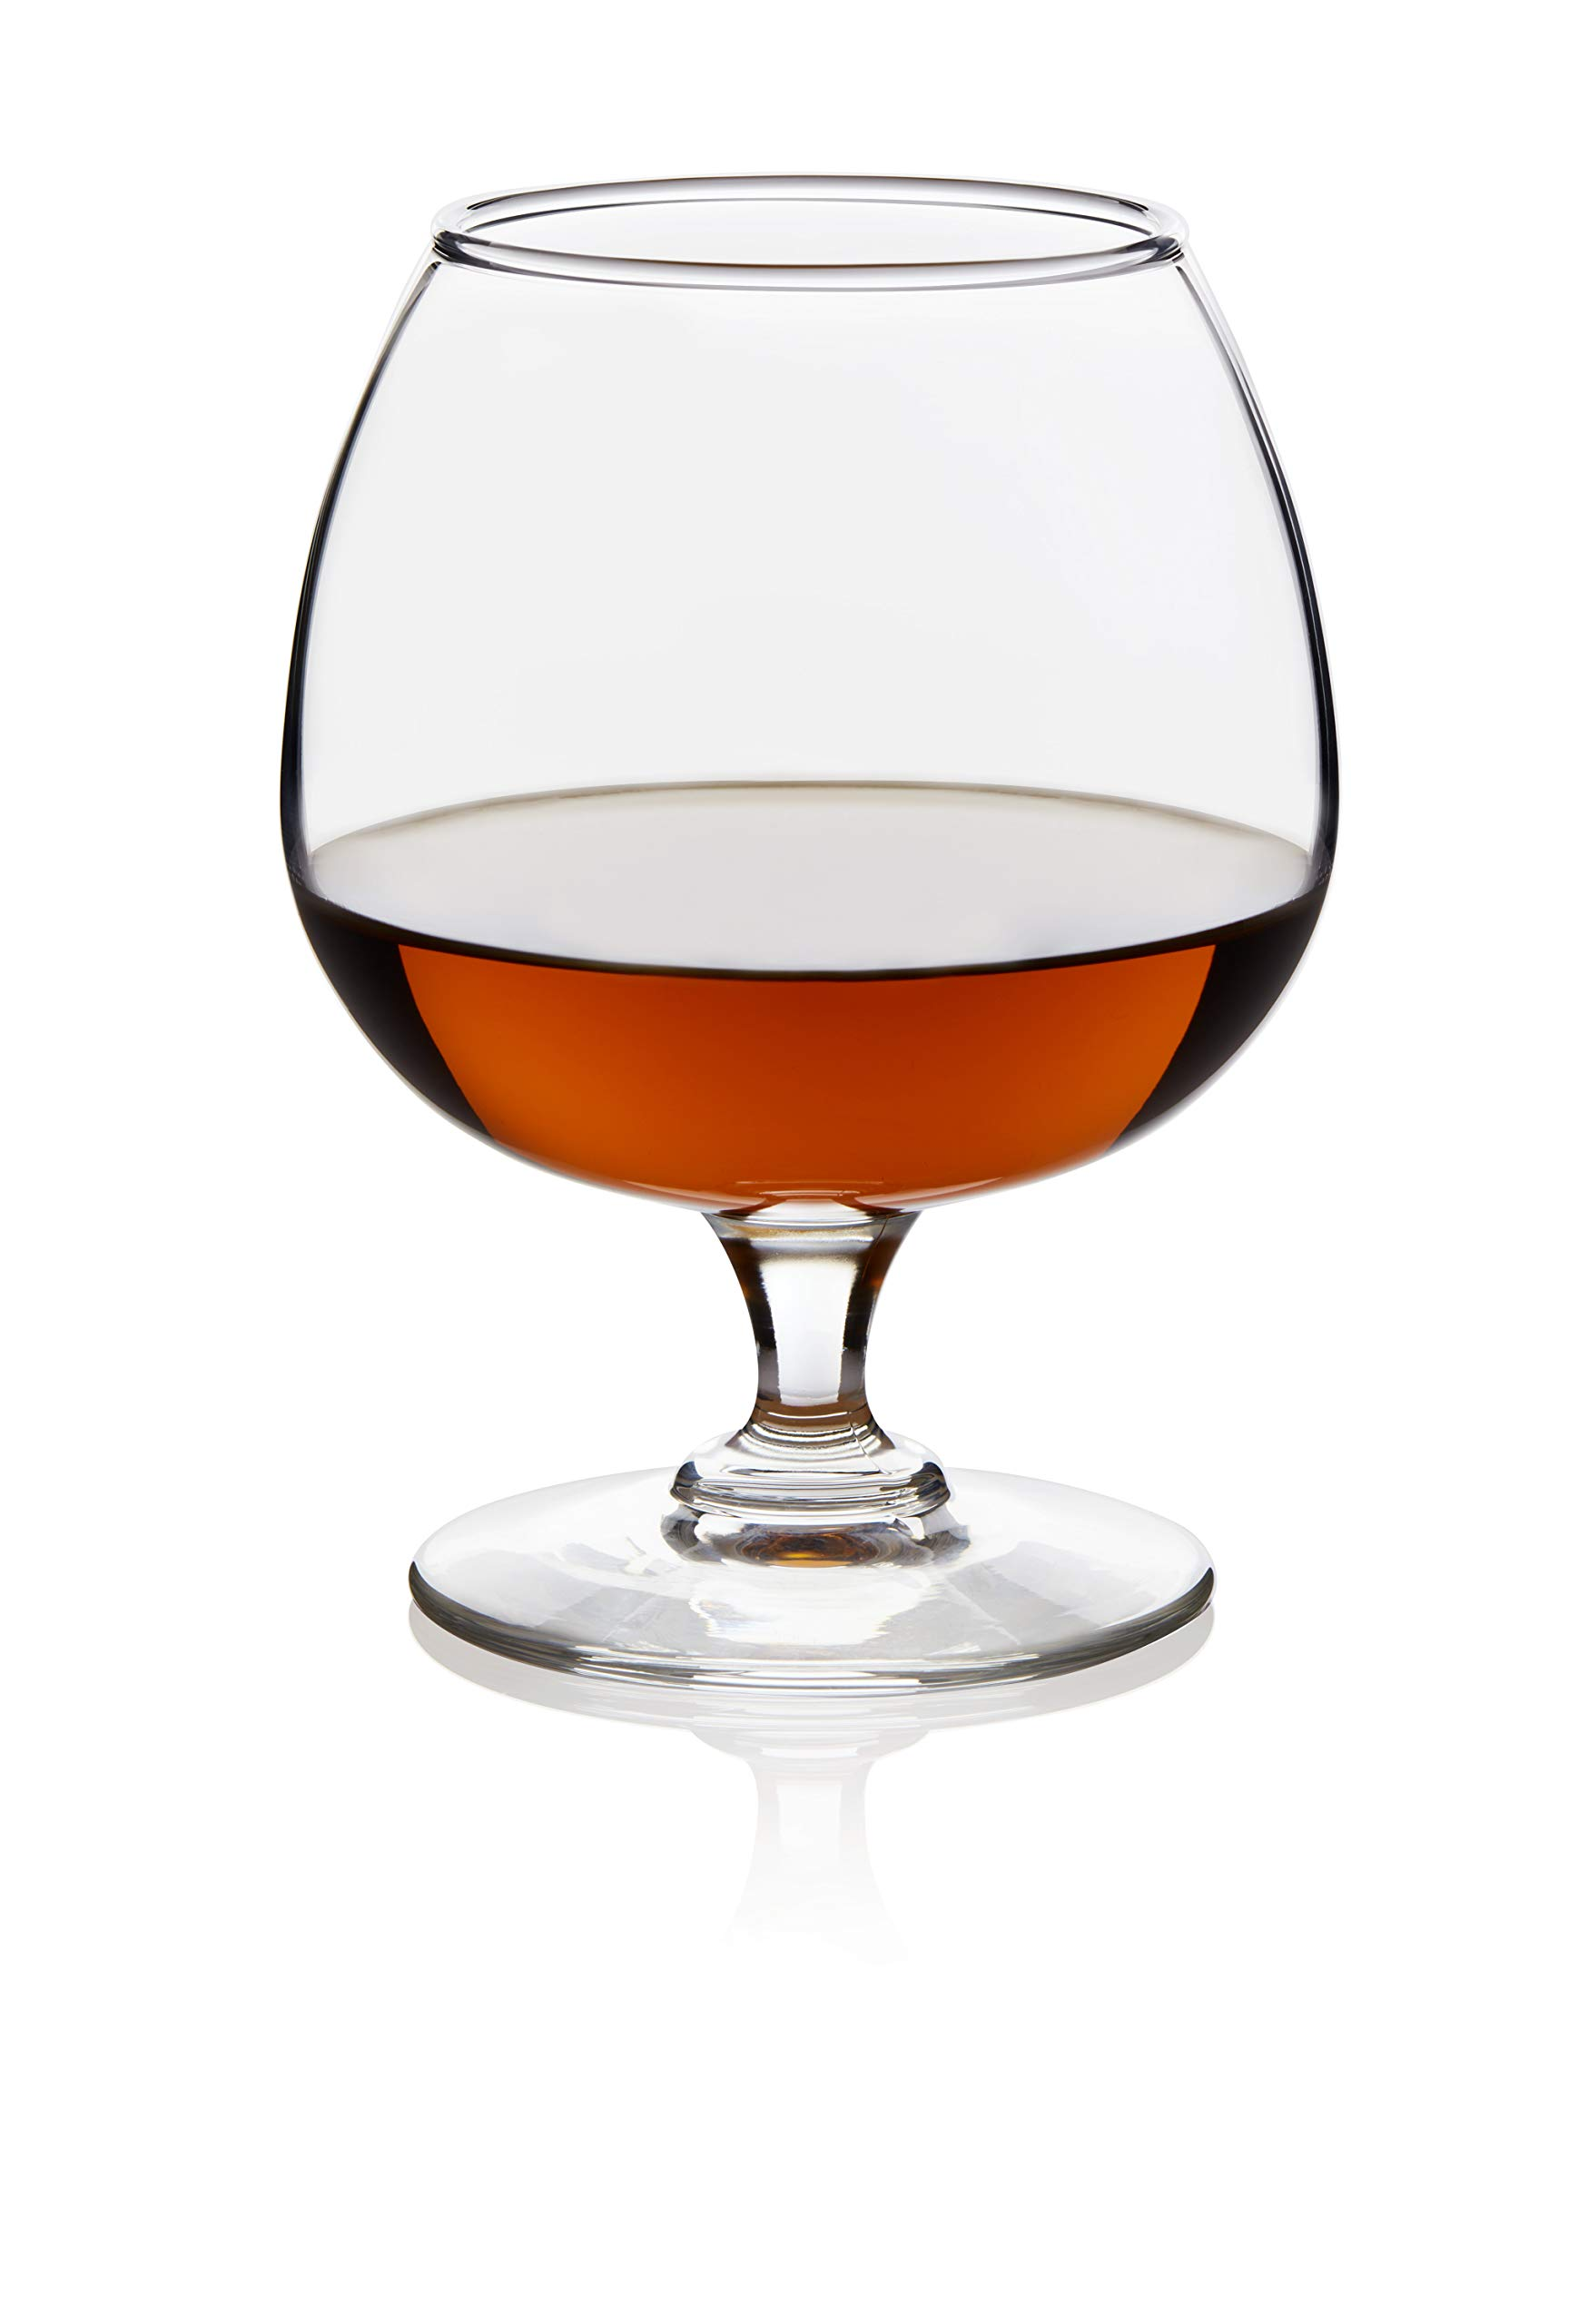 Libbey Craft Spirits 4-piece Cognac Glass Set